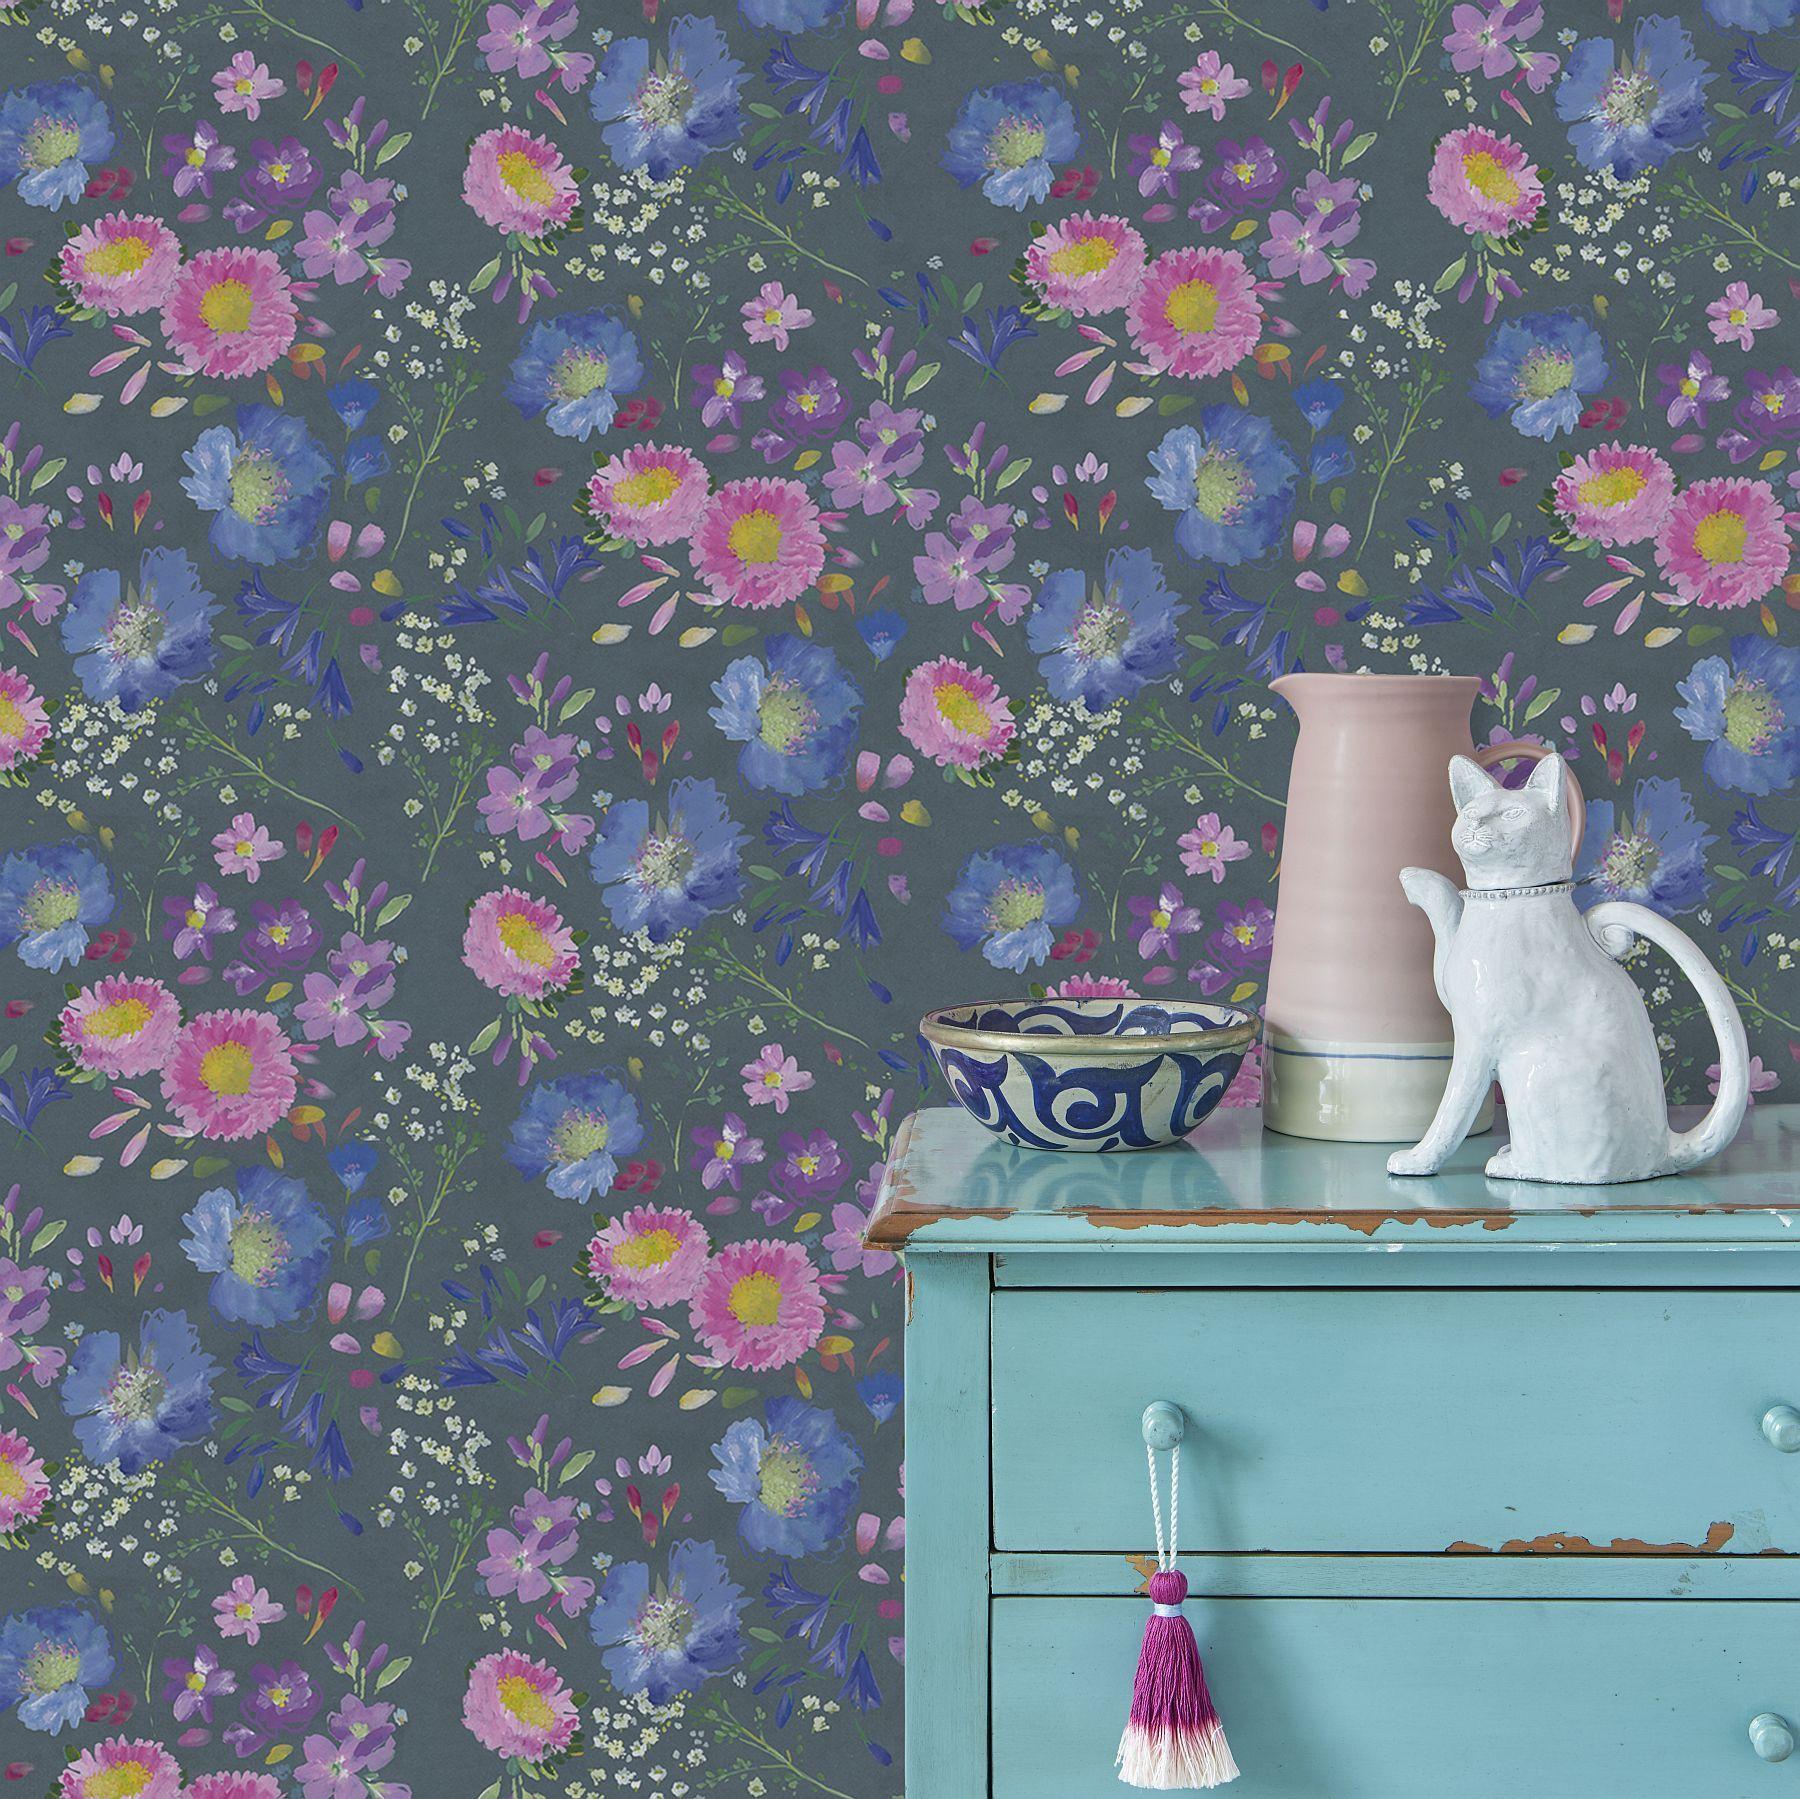 bluebellgray Kippen Smoke Wallpaper extra image Floral